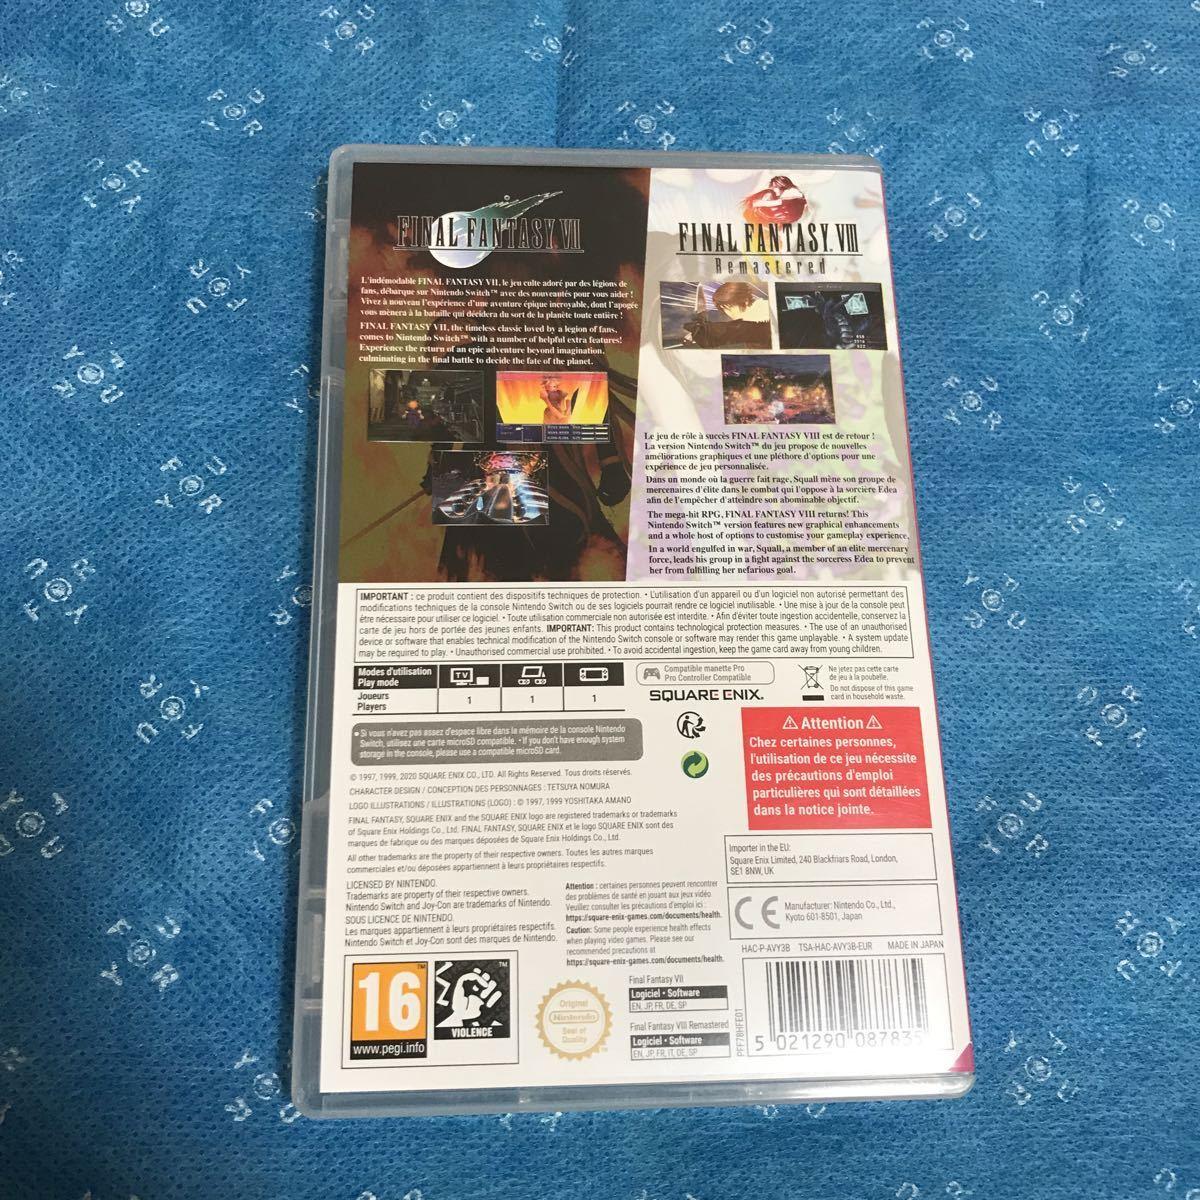 Final Fantasy VII & VIII Remastered Twin Pack 欧州版 Switch スイッチ ファイナルファンタジー7&8 FF7 FF8 日本語に対応☆